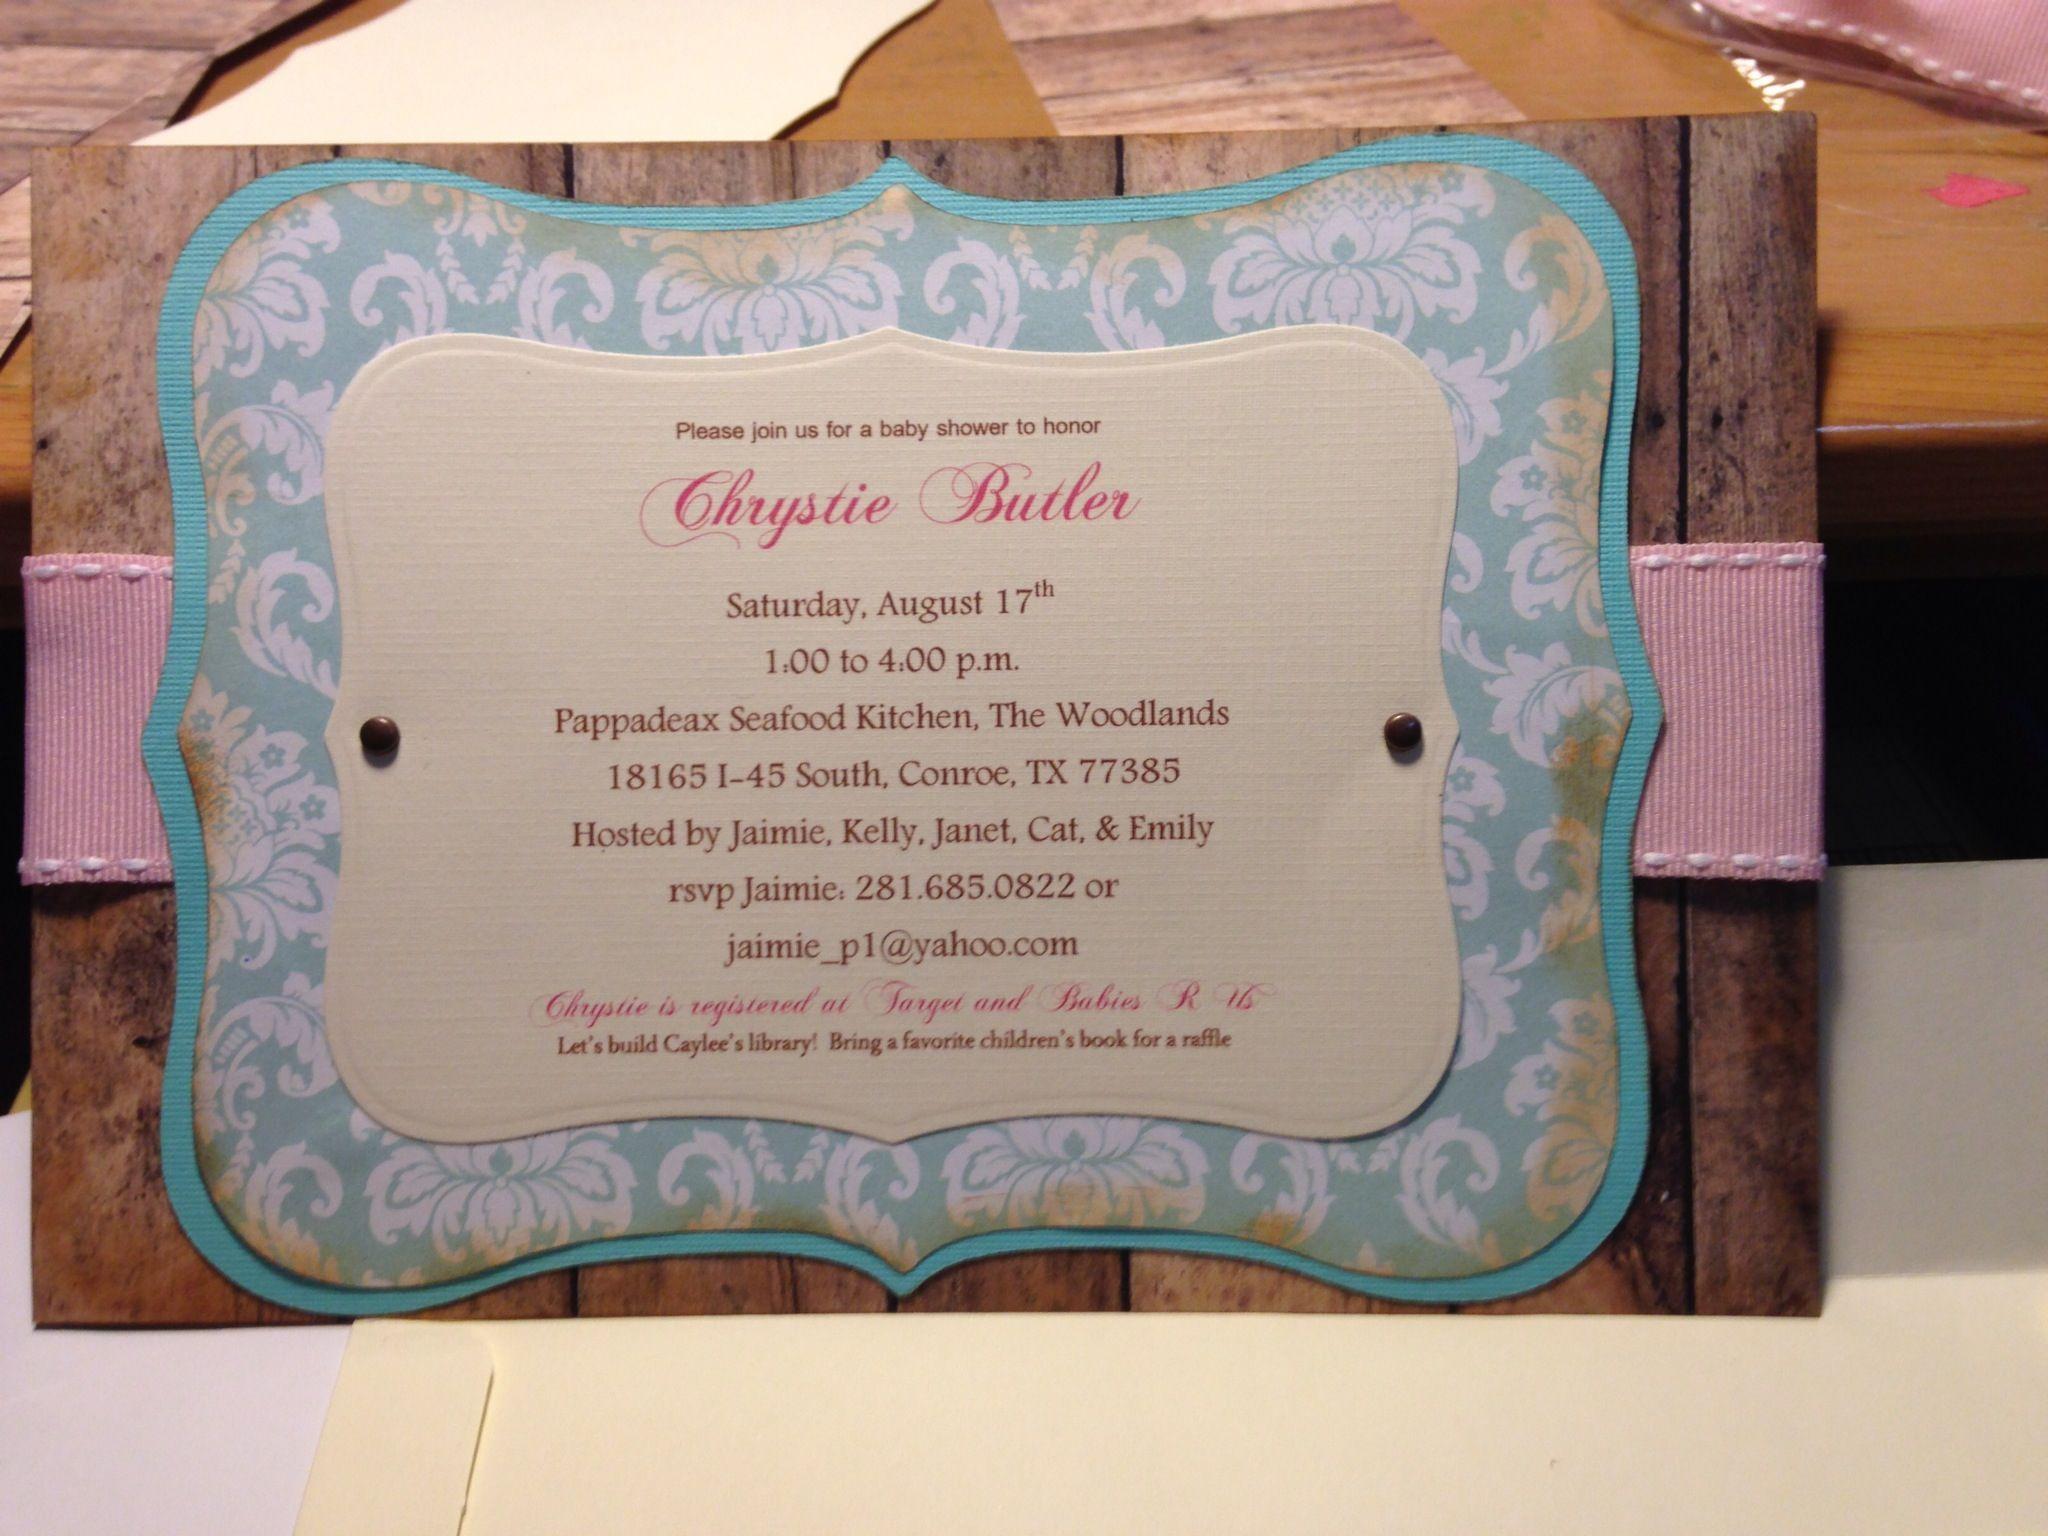 Vintage Invitations Baby Shower is amazing invitations design